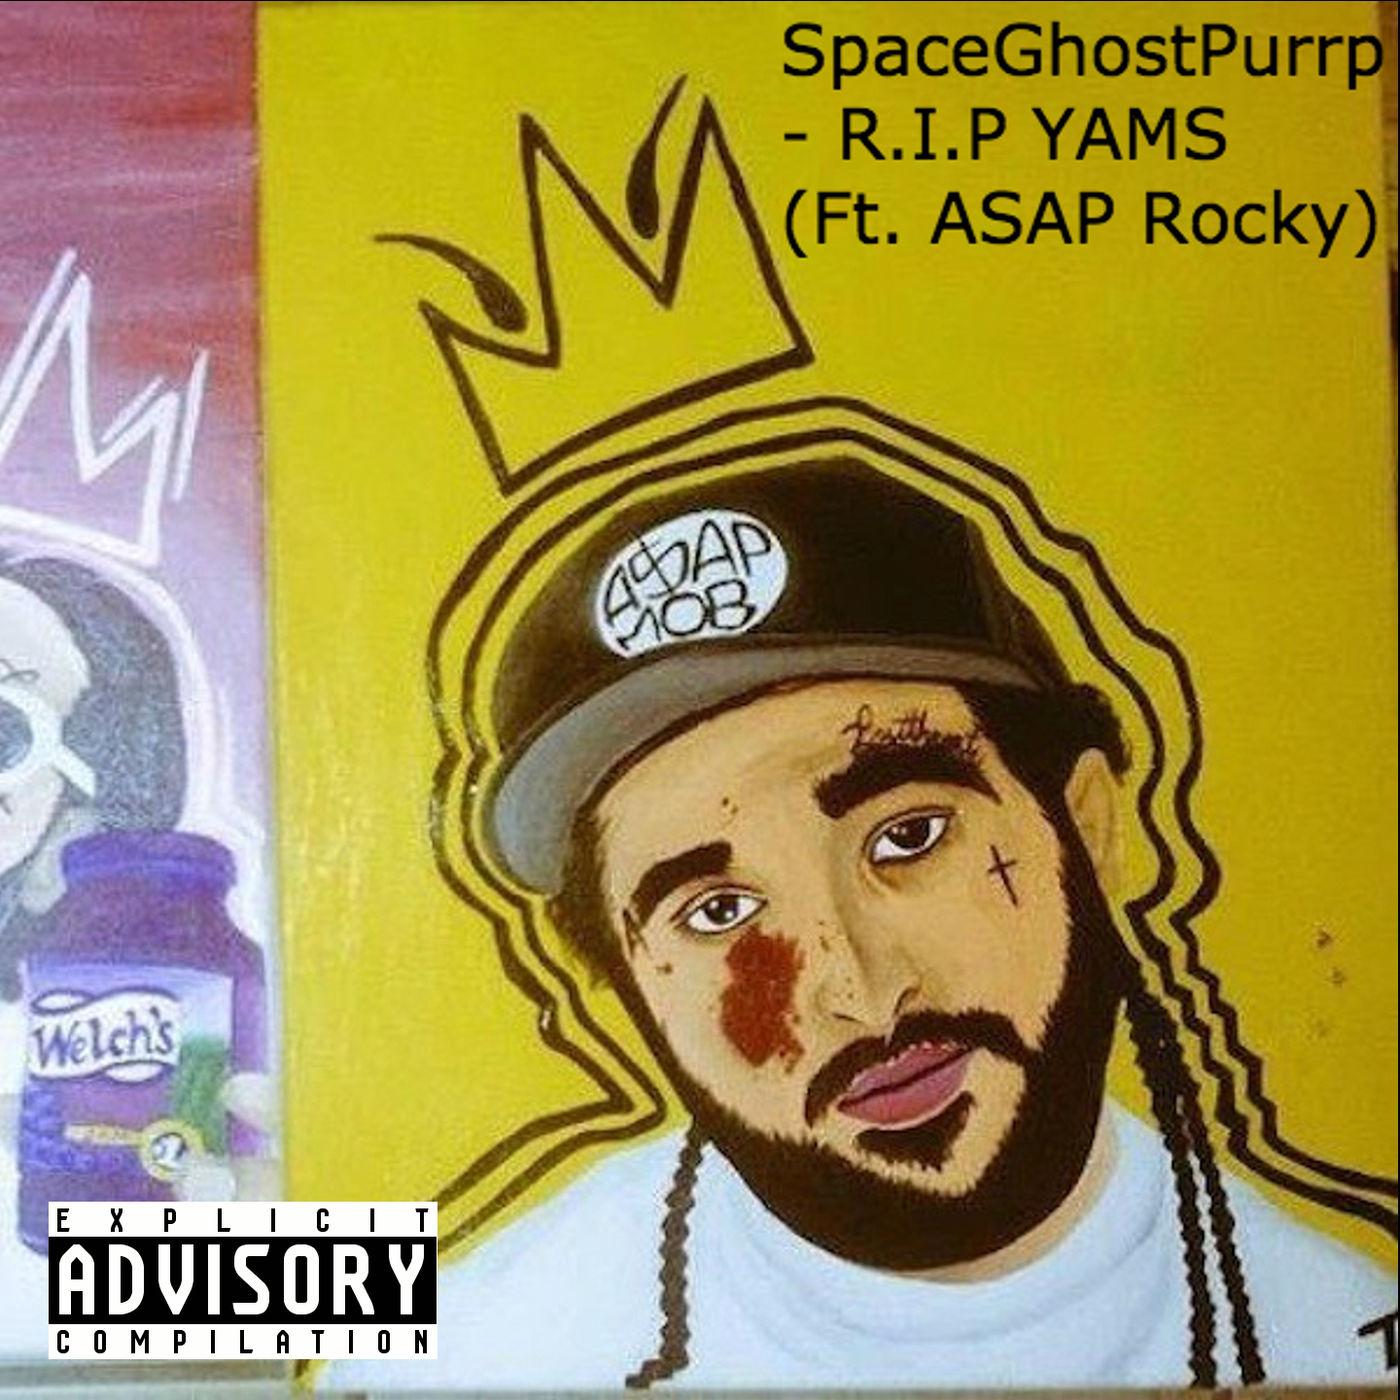 SpaceGhostPurrp - R.I.P YAMS (feat. A$AP Rocky) - Single  Cover